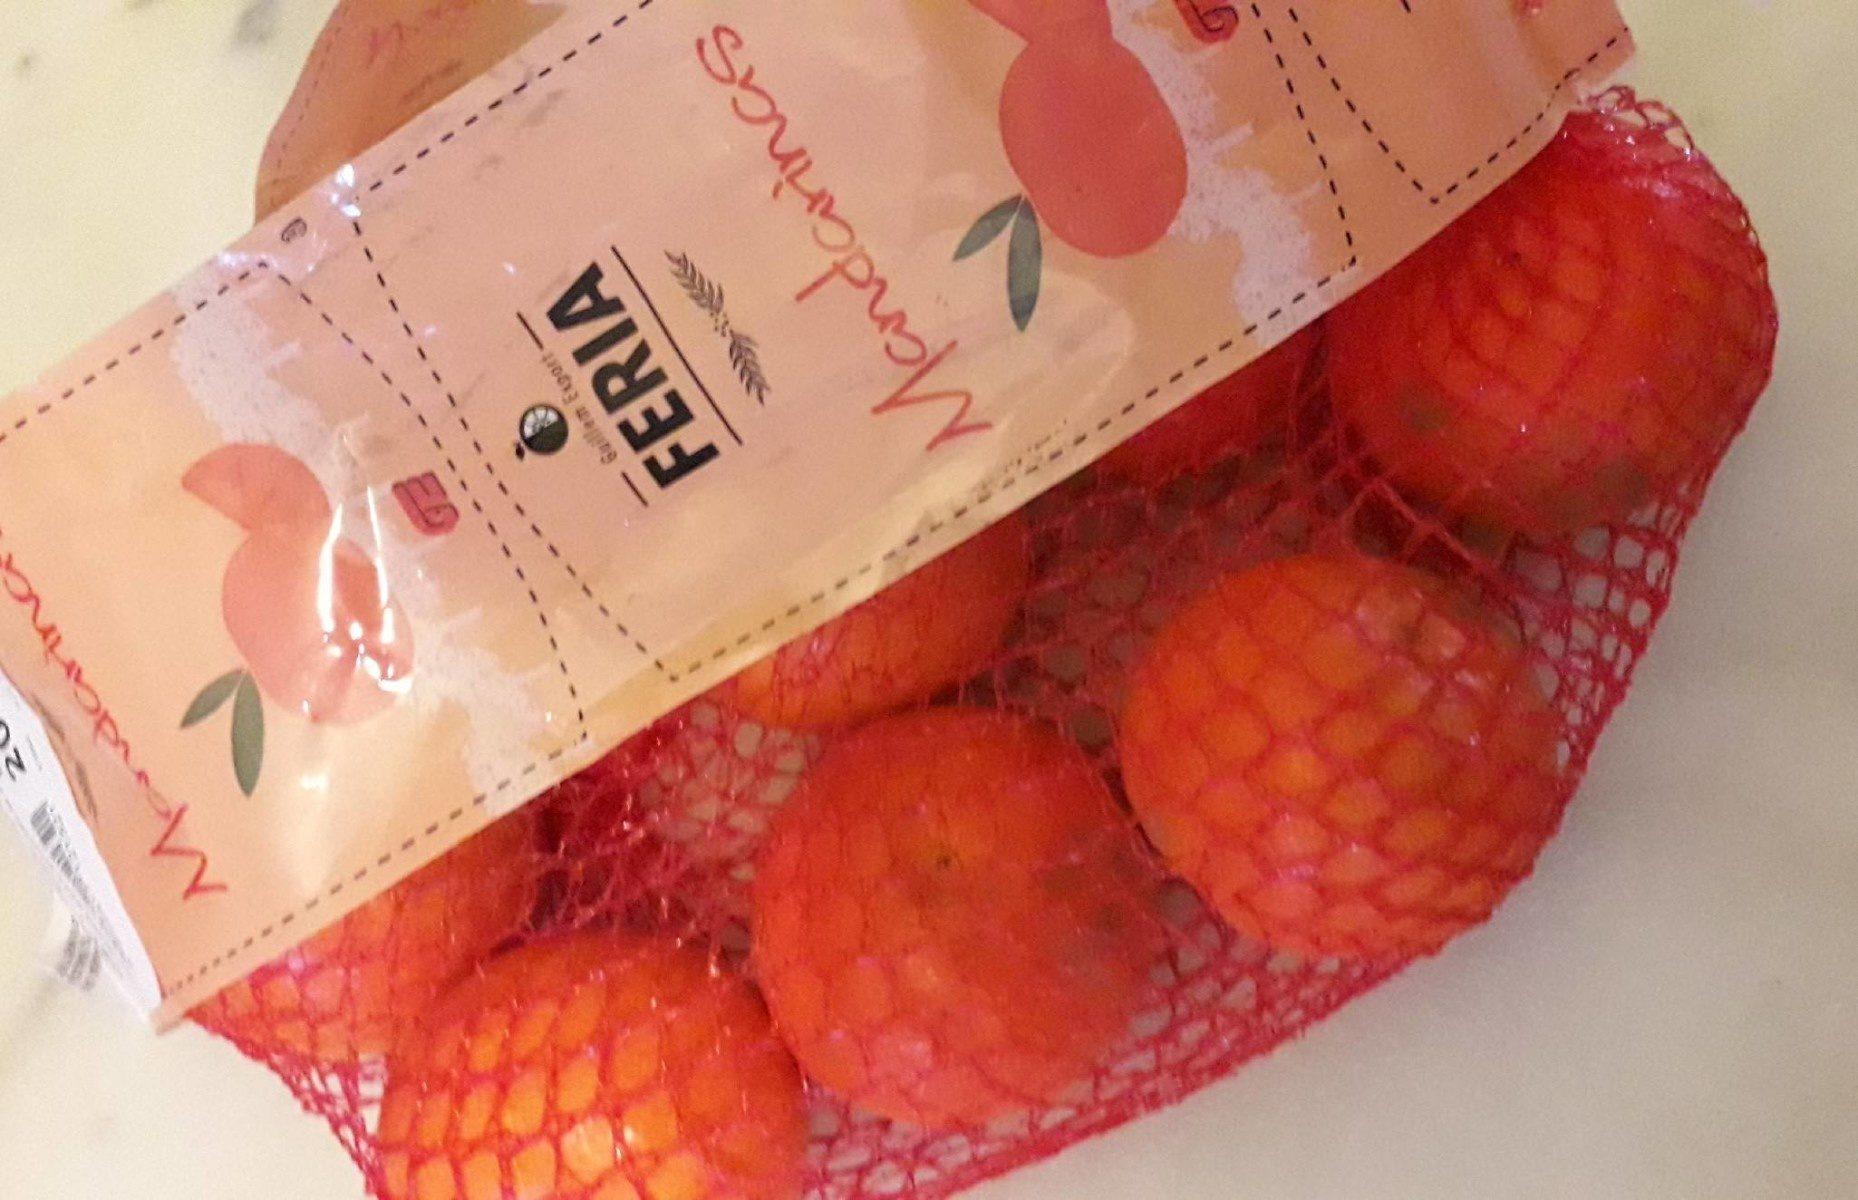 mandarine clemenvilla - Produit - fr